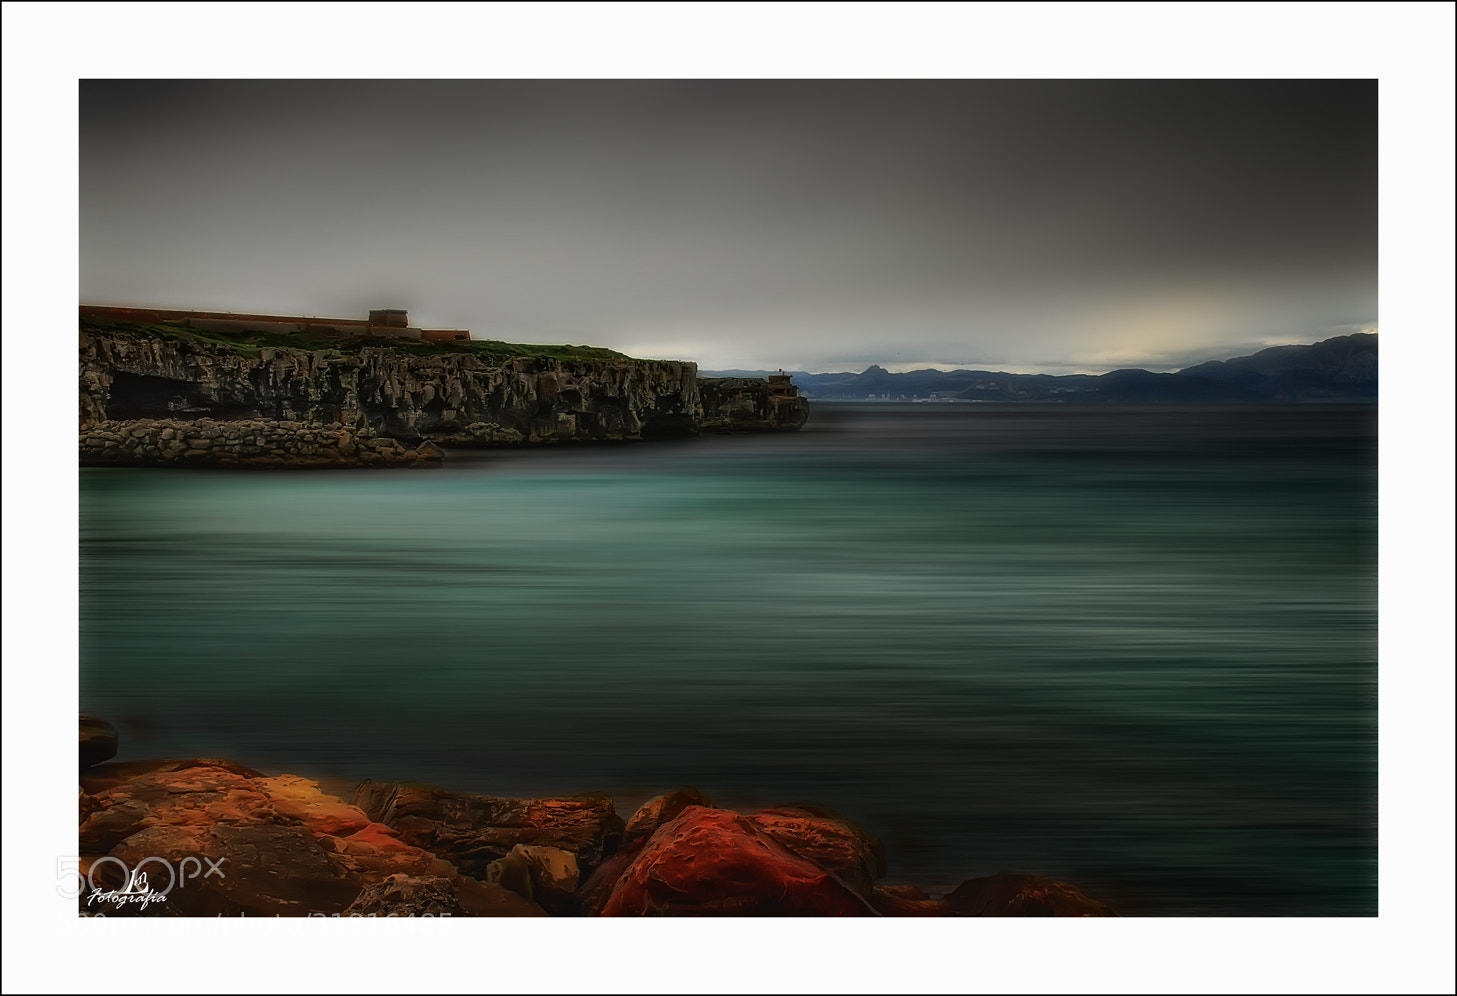 Photograph Pigeon Island, Tarifa (Cadiz, Spain) by Manuel Lancha on 500px